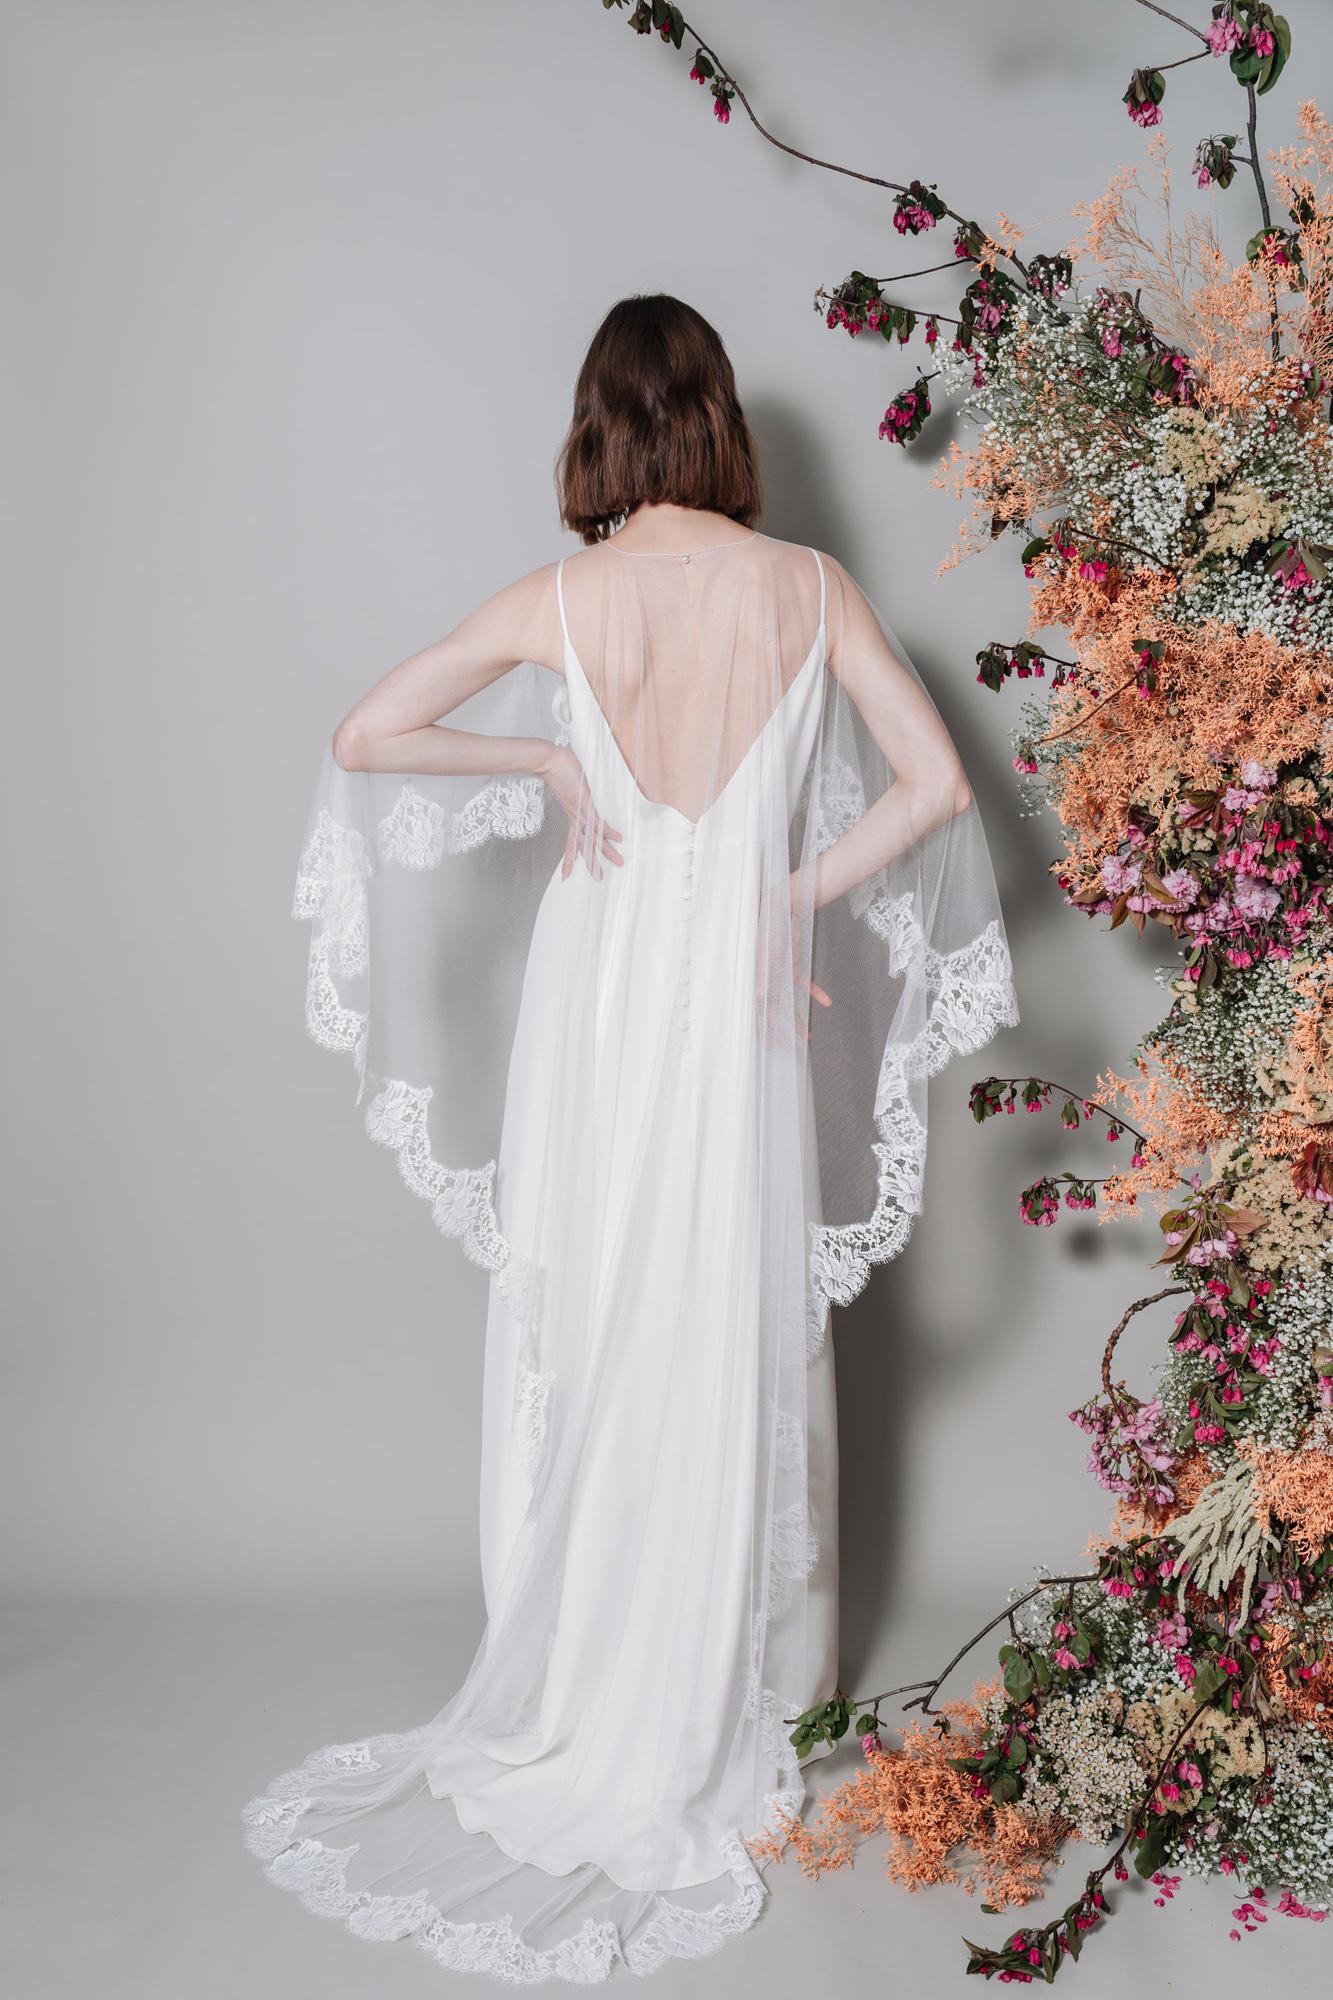 Kate-Beaumont-Sheffield-Rose-Lace-Hem-Bridal-Cape-Veil-10.jpg